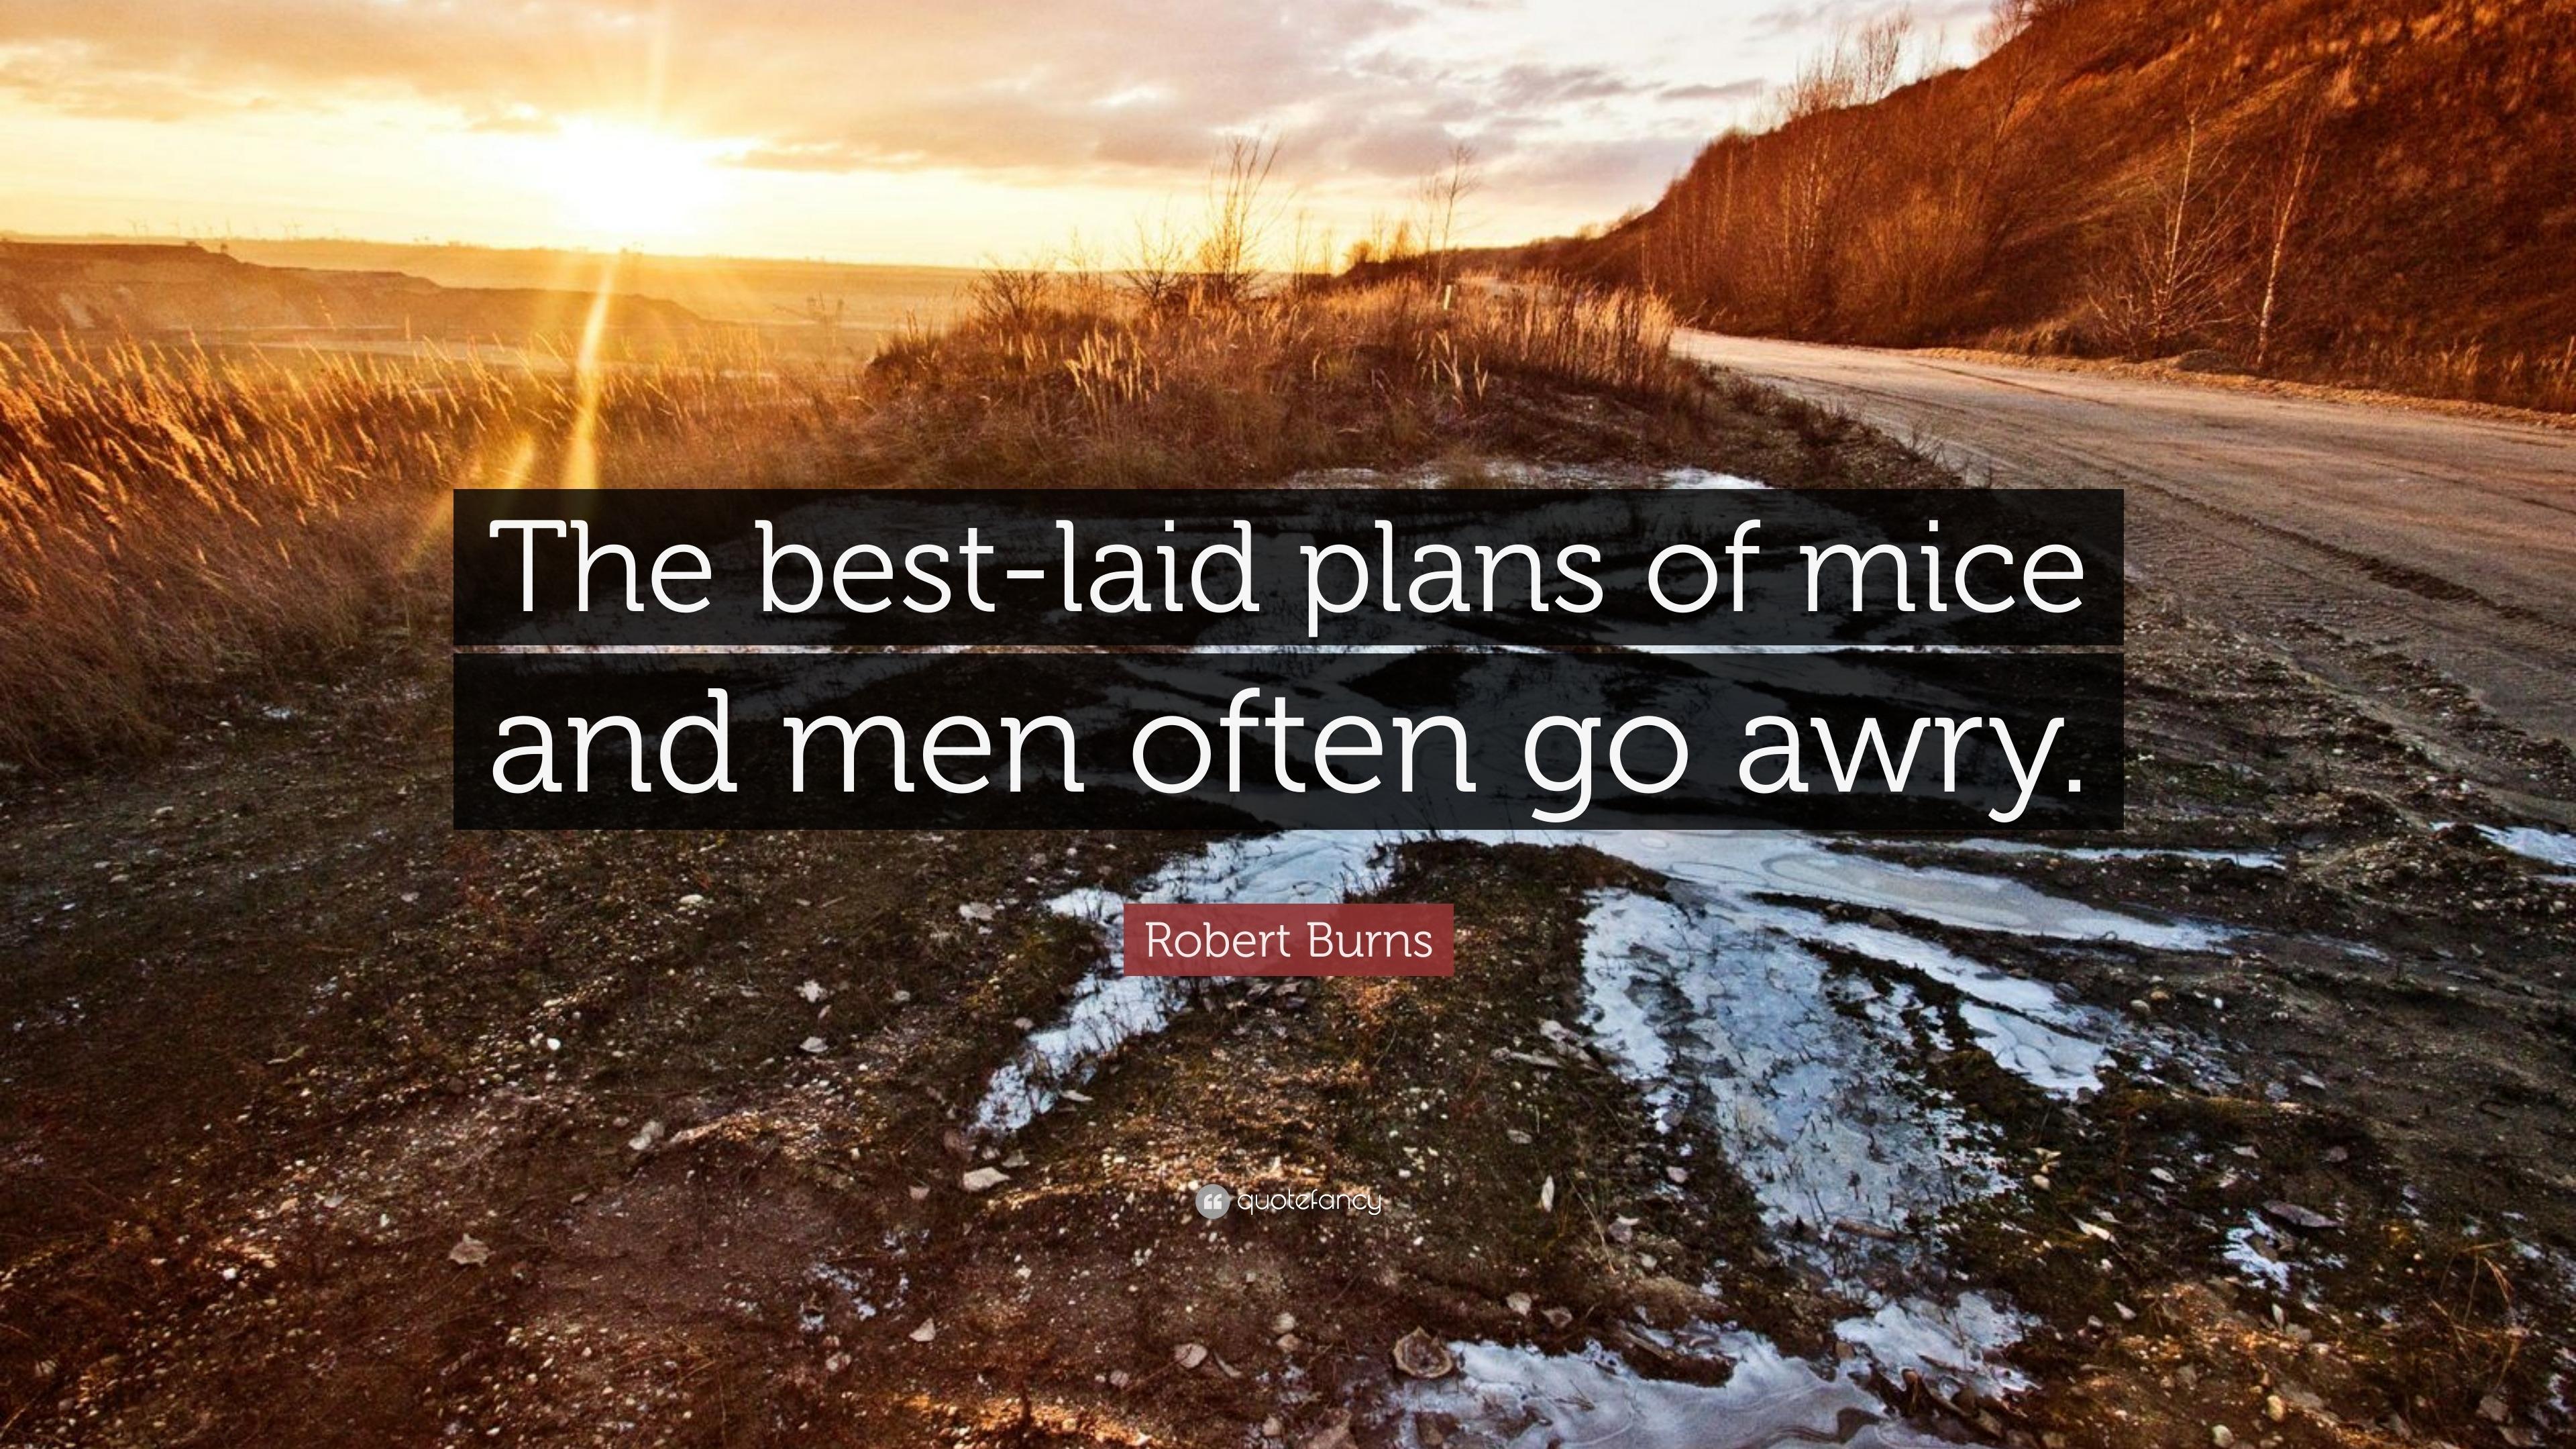 Robert Burns Quote cThe bestlaid plans of mice and men often go